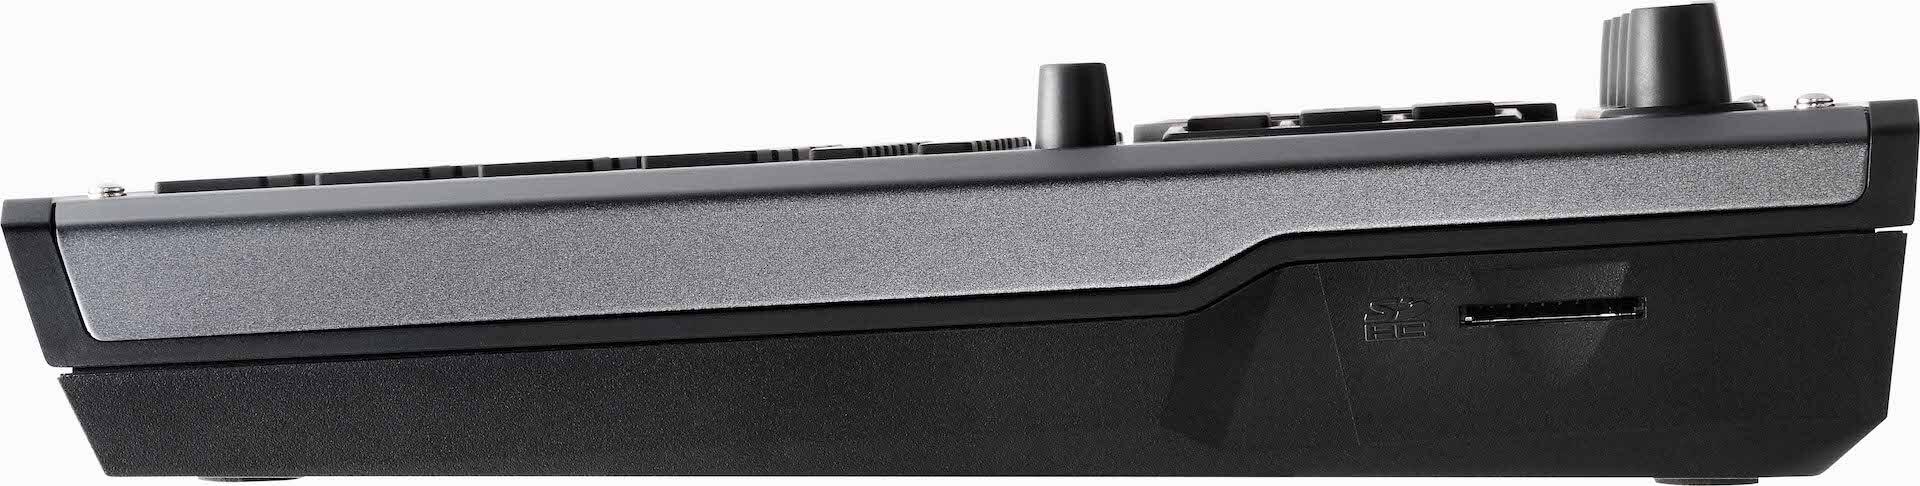 Rolandから最新サンプラー『SP-404MKII』が発売決定!ベロシティ&USB-Cも対応 tech211014_roland_sp404mk2_9